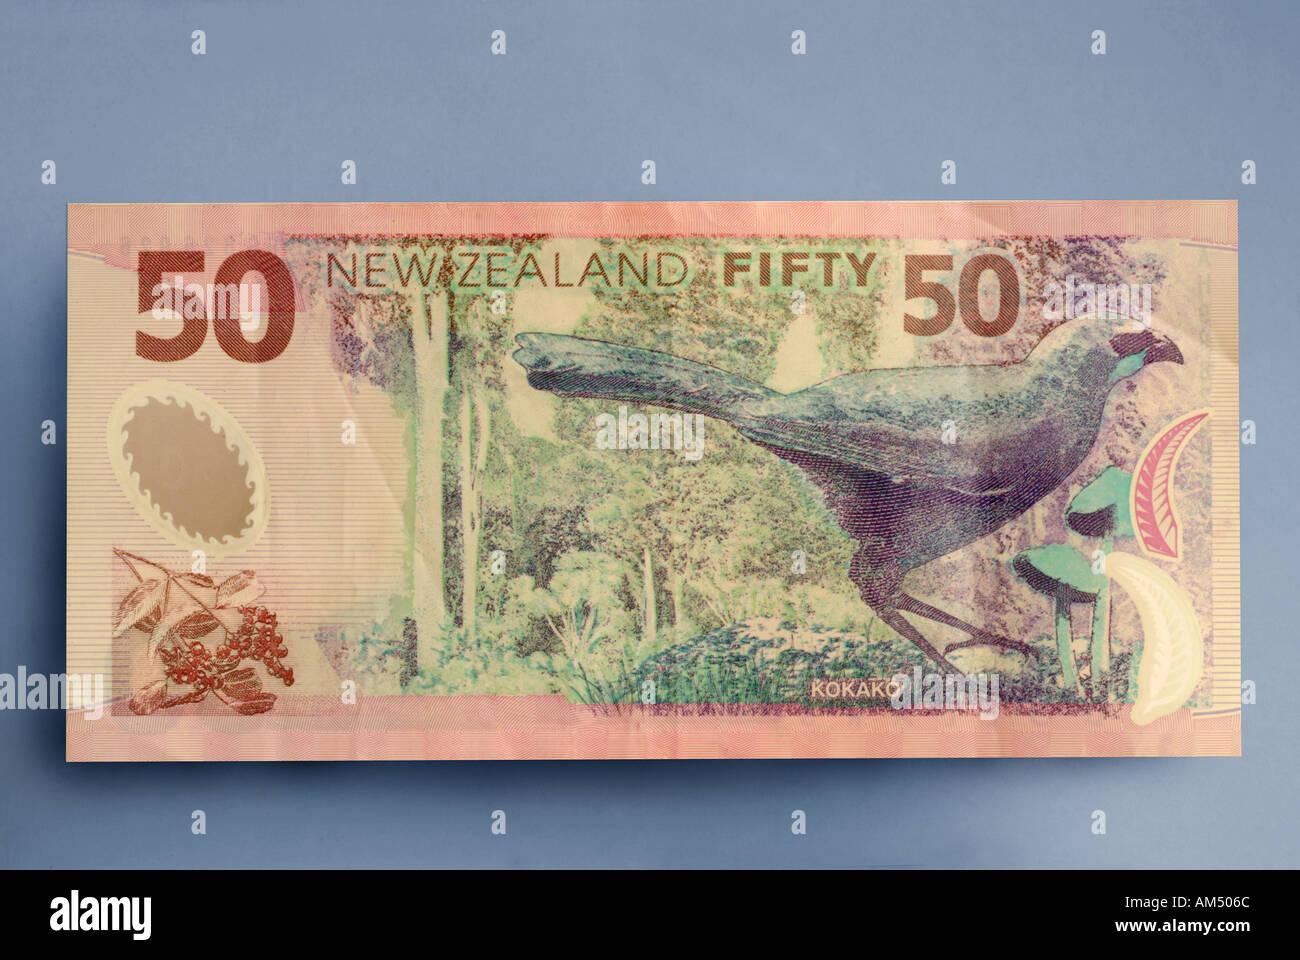 50 dollar bill from New Zealand Stock Photo: 1331307 - Alamy